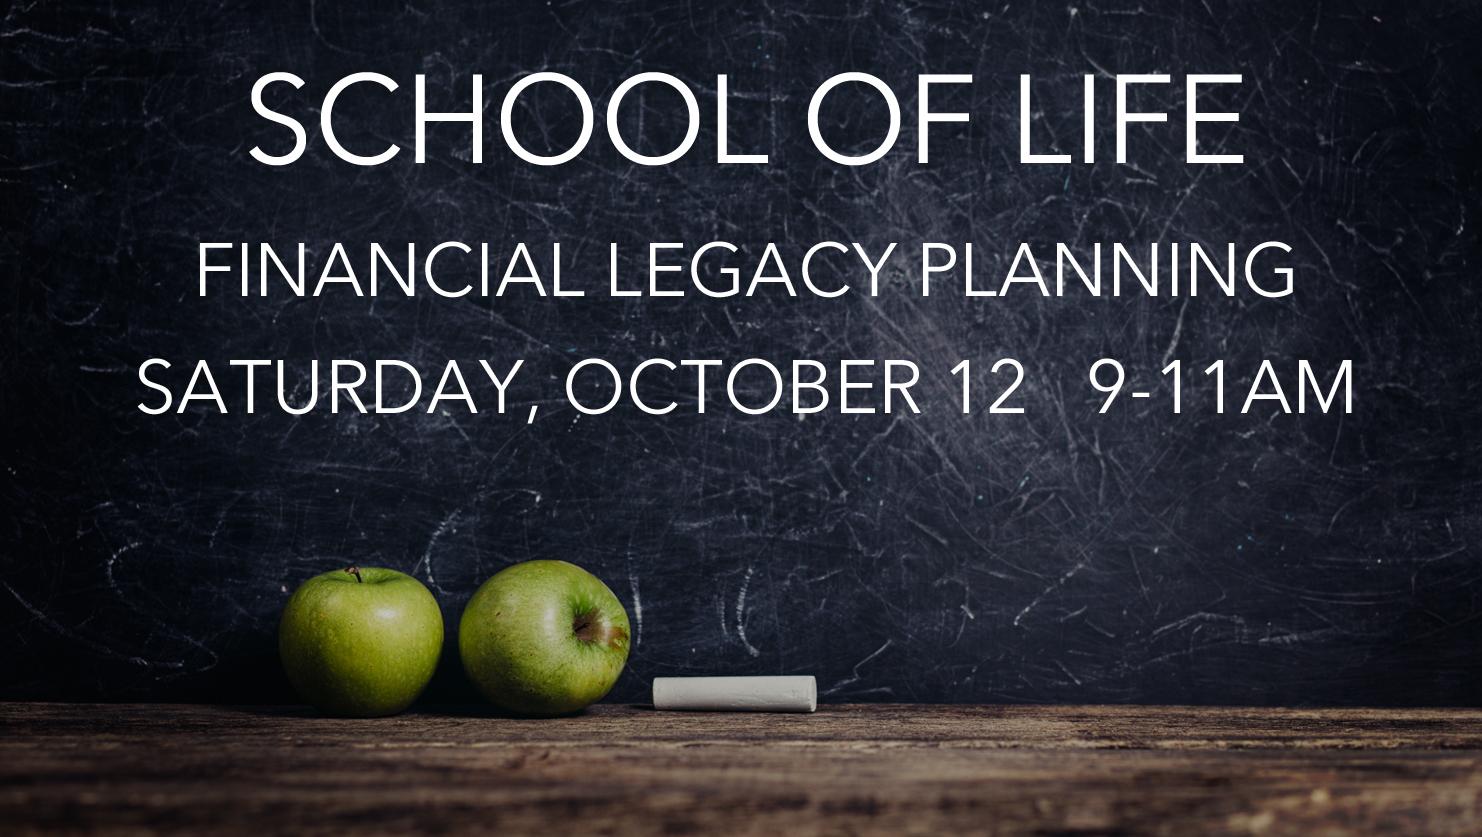 school-of-life-financial-legacy-planning.jpg